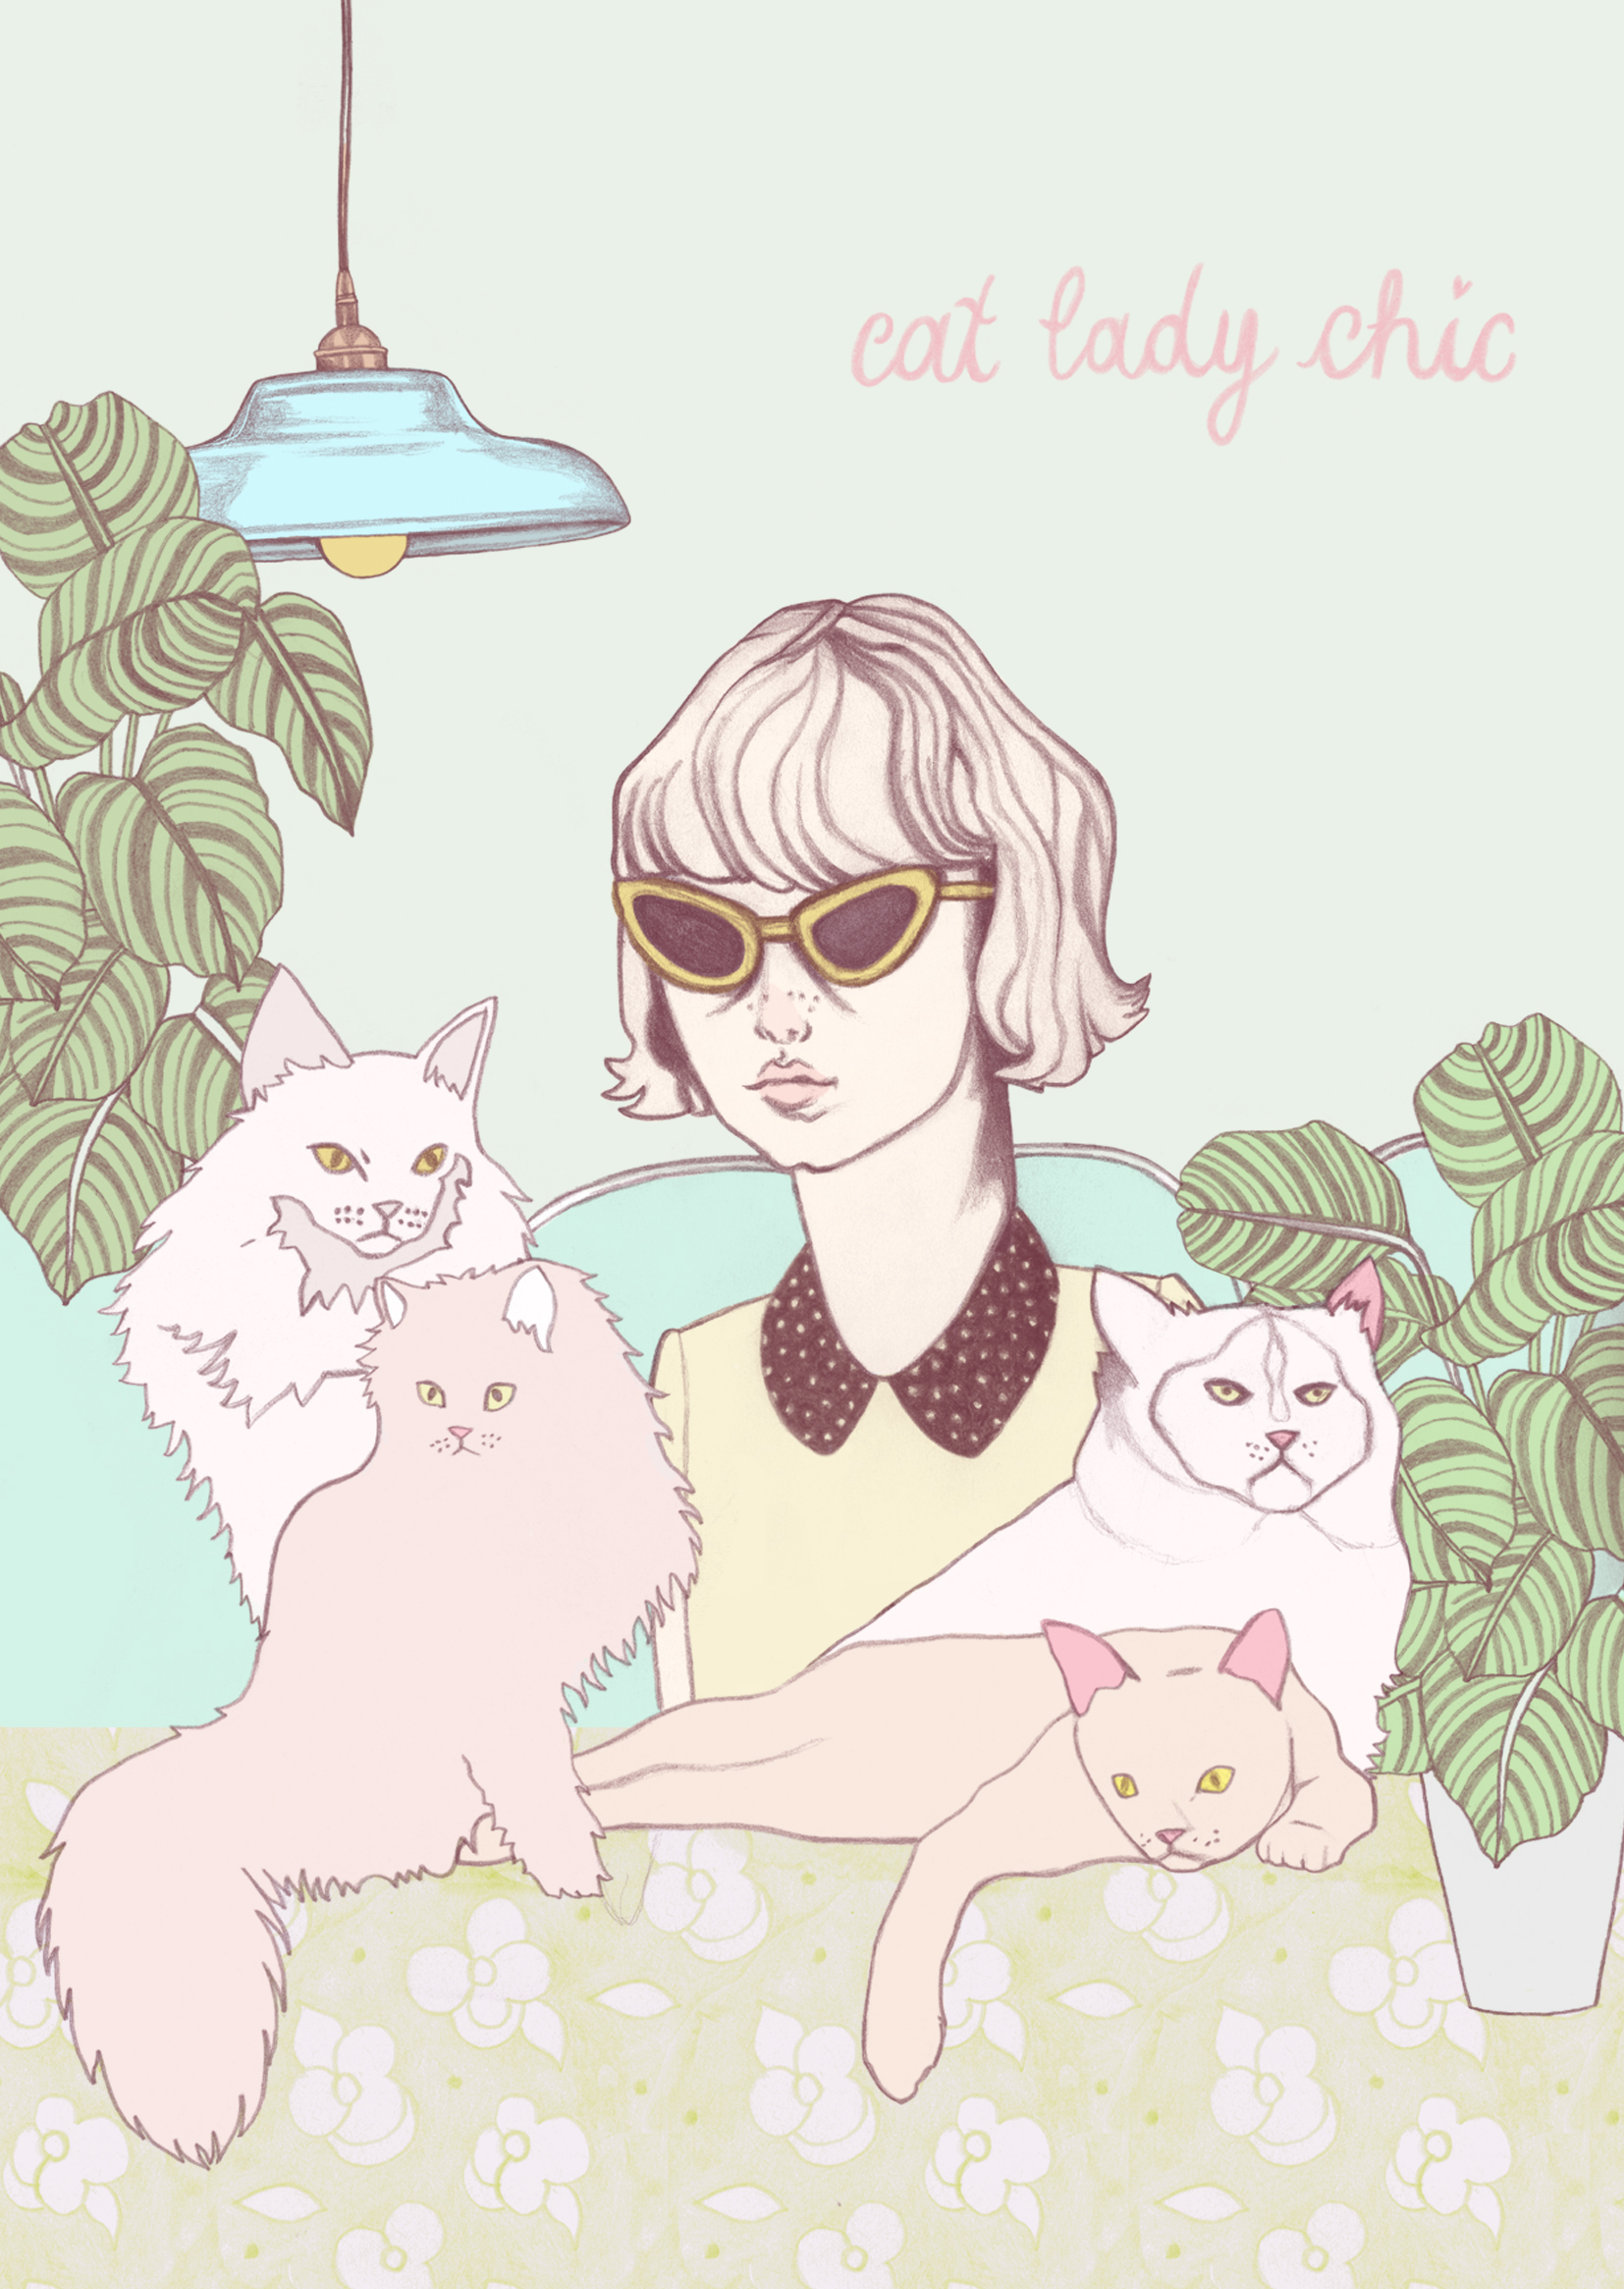 Cat lady chic card2.jpg